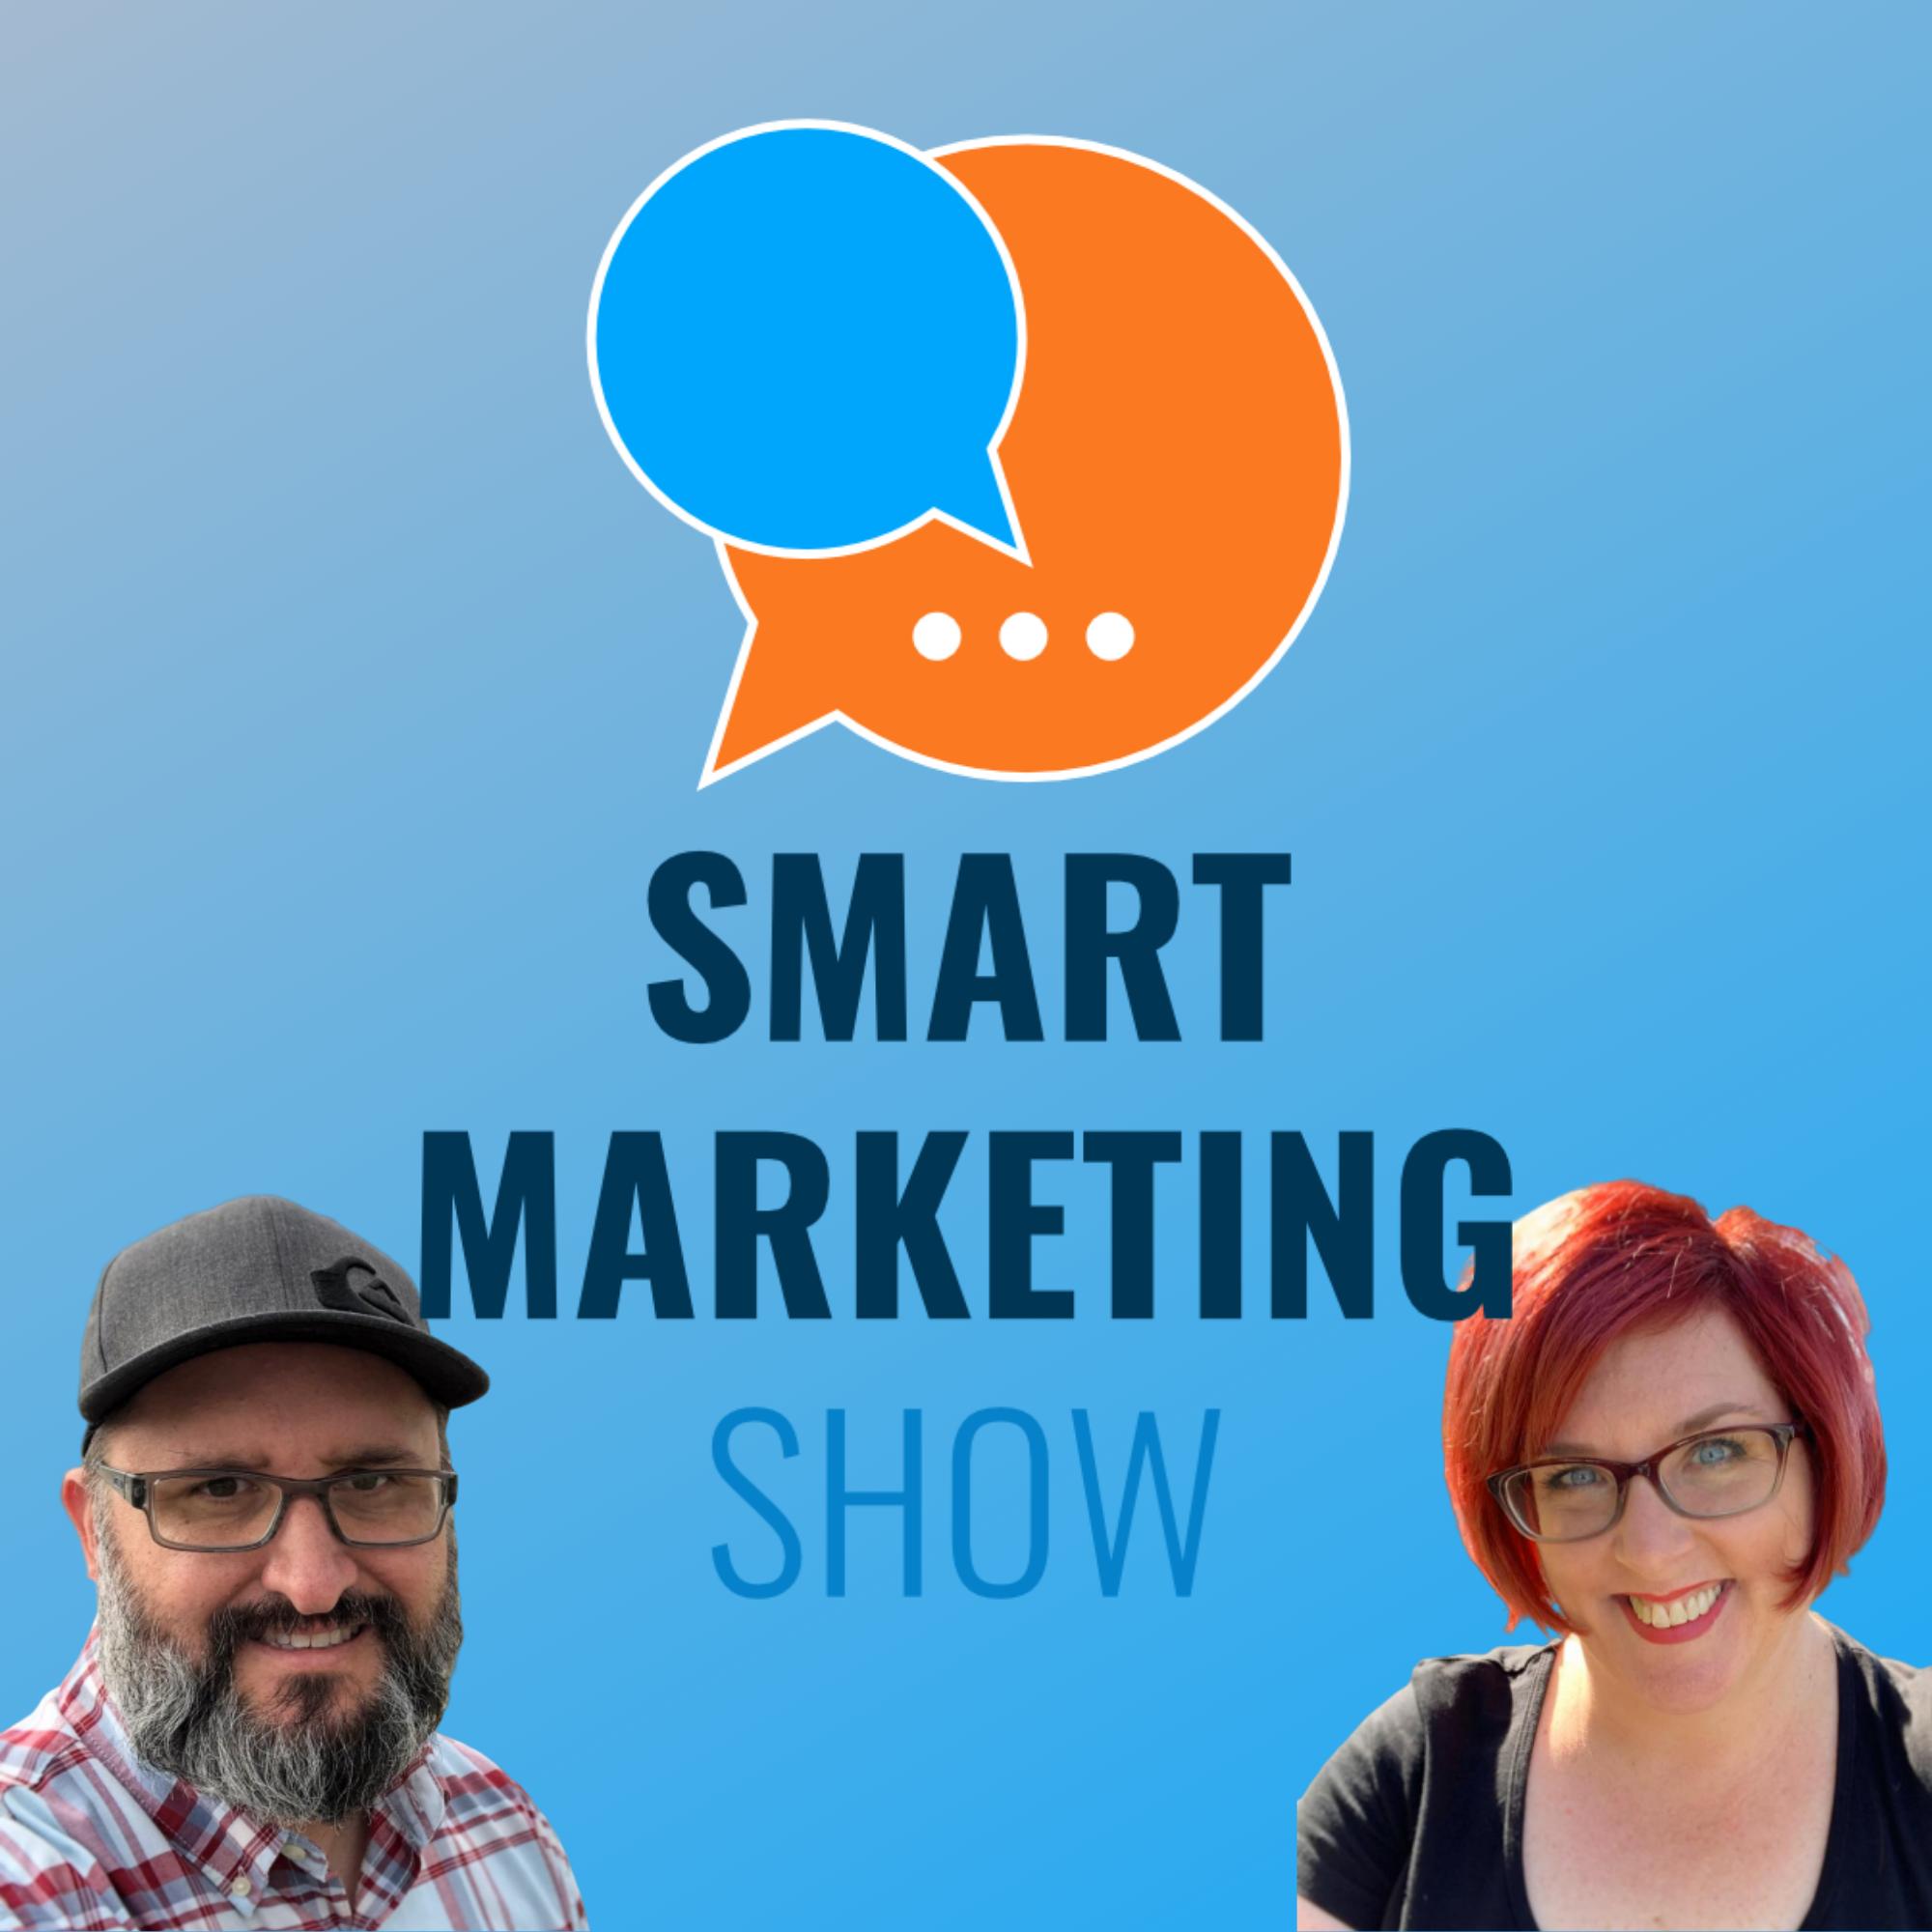 Smart Marketing Show logo itunes